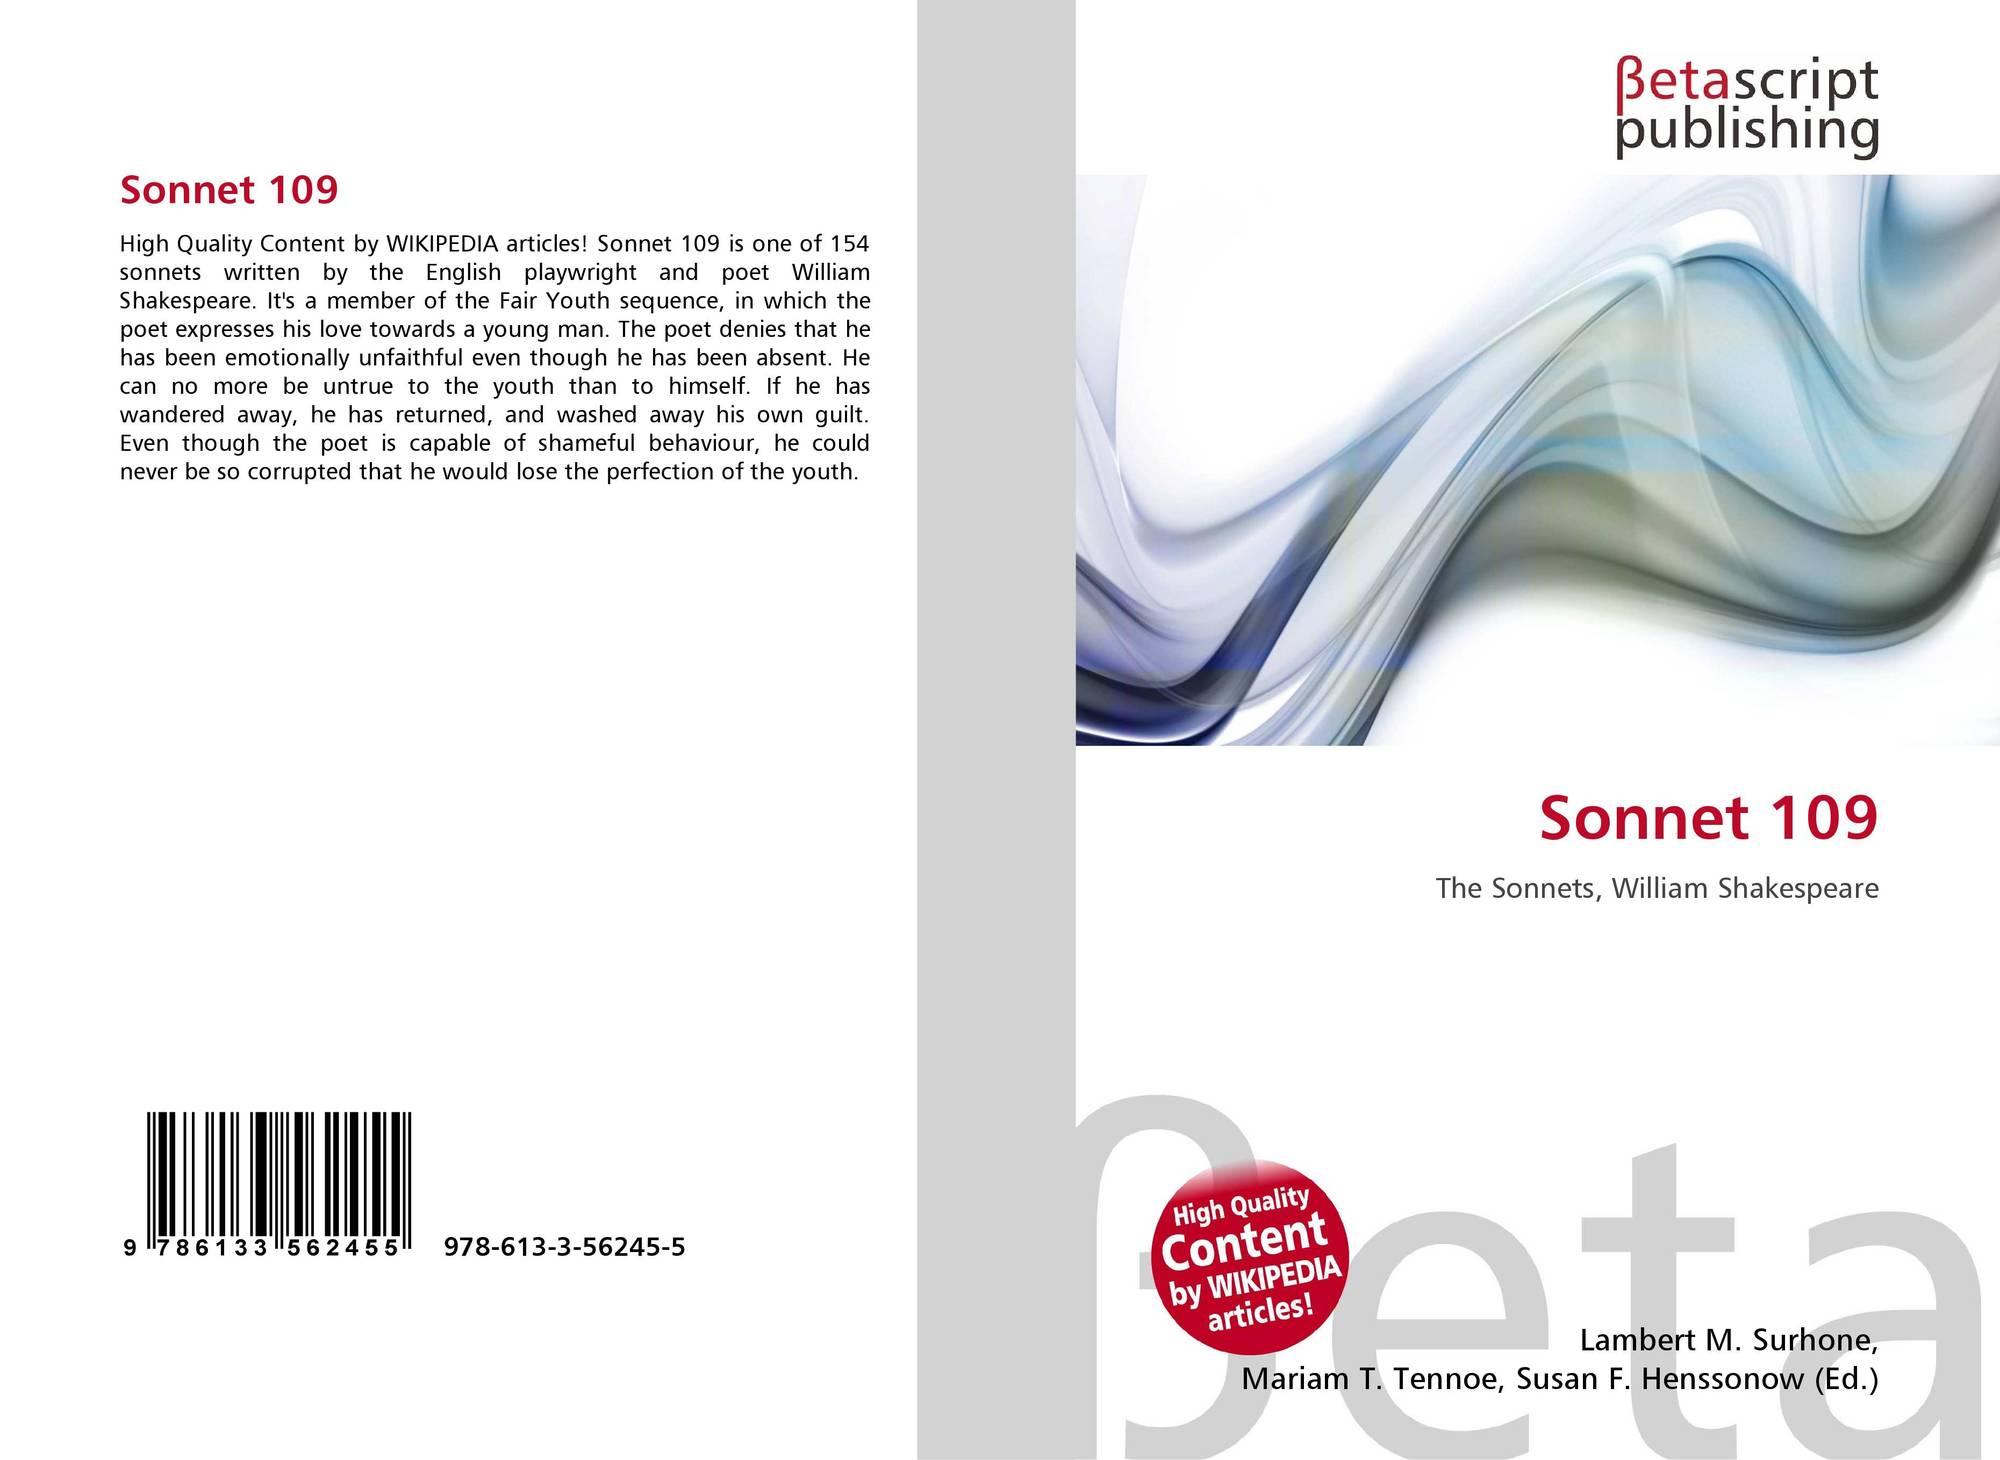 sonnet 2 analysis